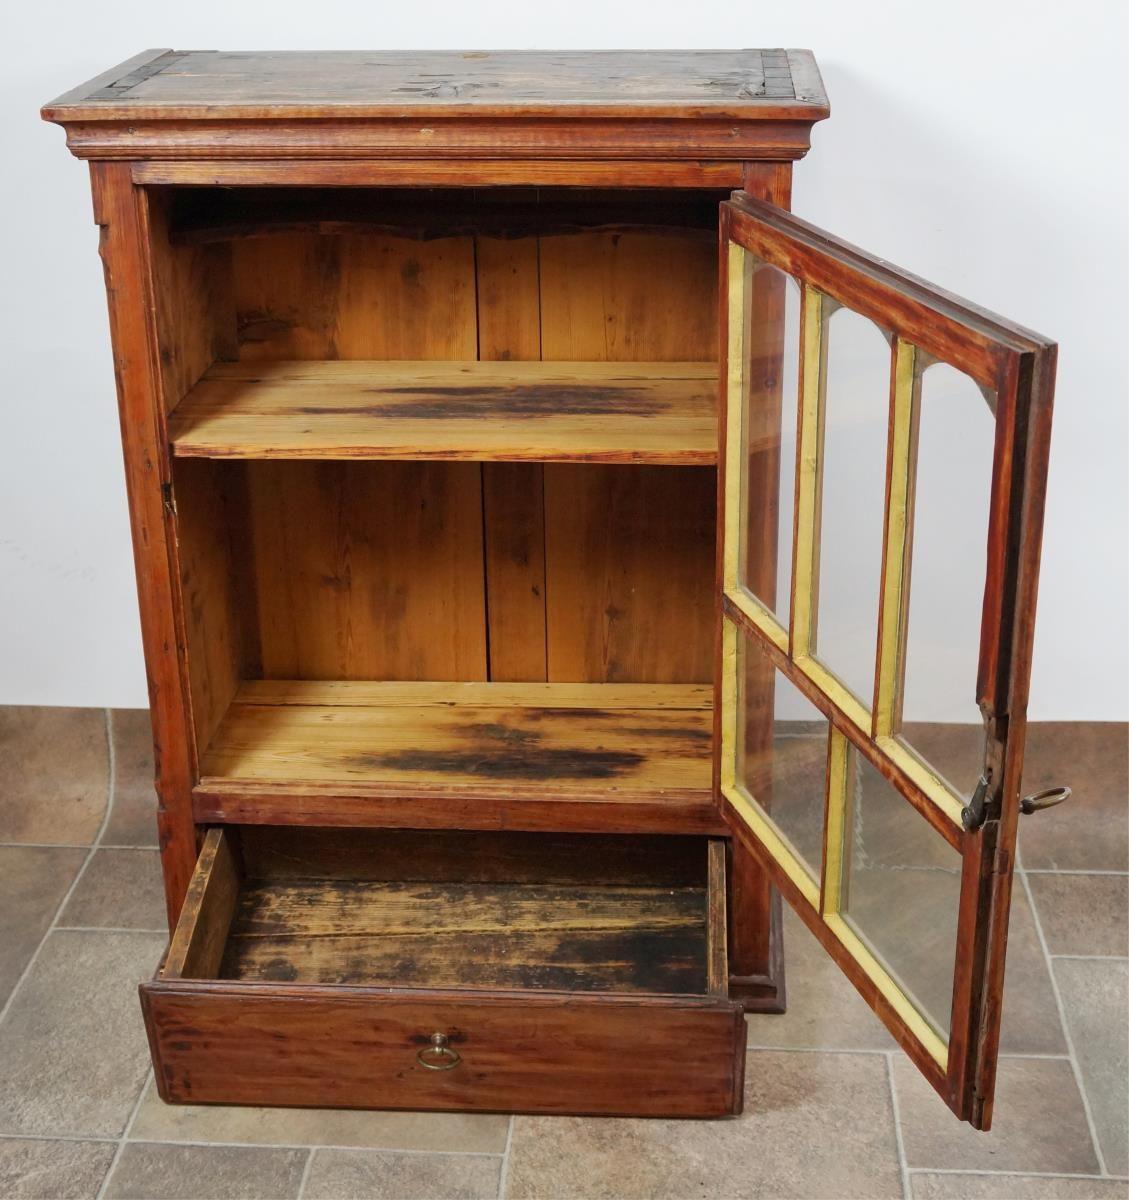 Rustic Wood Medicine Cabinet Lot 441 Rustic Wood Medicine Cabinet Auction Pinterest